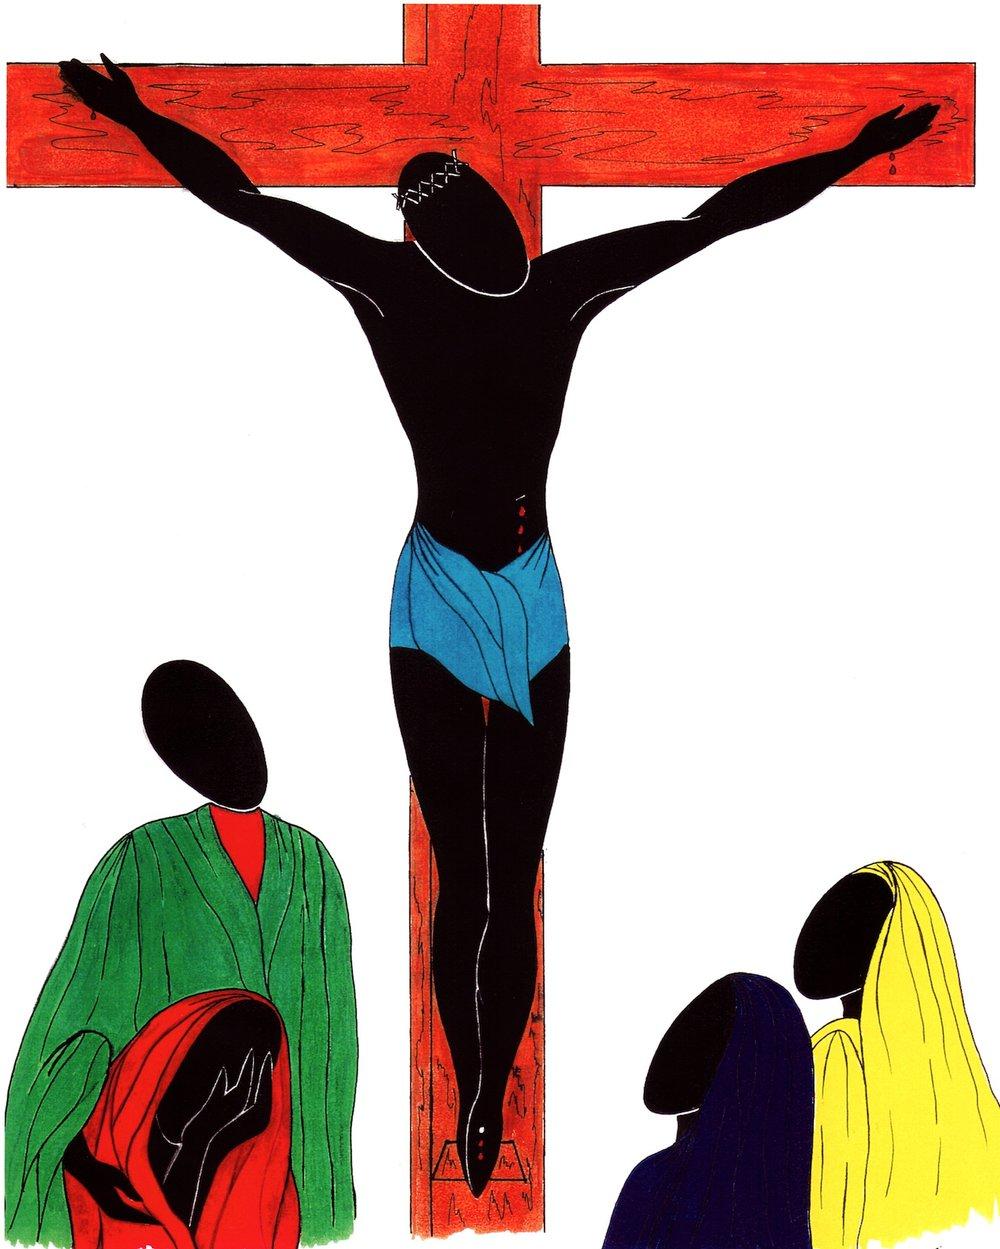 The Crucufixion